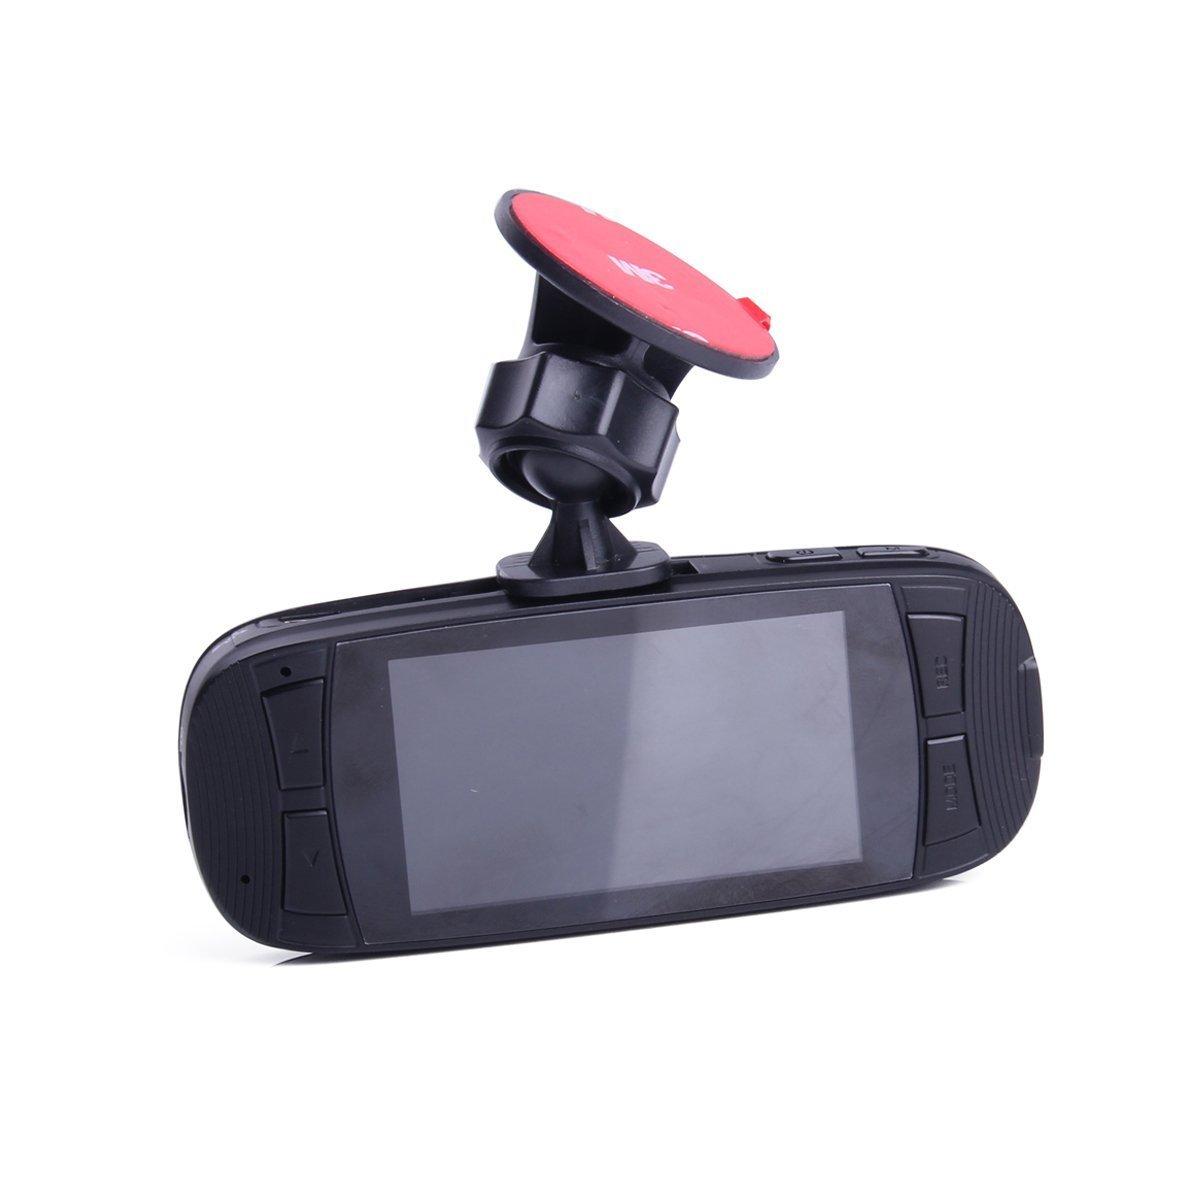 Sony IMX323 Car Dash Camera G-Sensor Capabilities G1WSGPS VIOFO G1W-S 2017 With GPS Receiver NT96650 Full 1080P HD Video /& Audio Recording Car DVR Camera Recorder